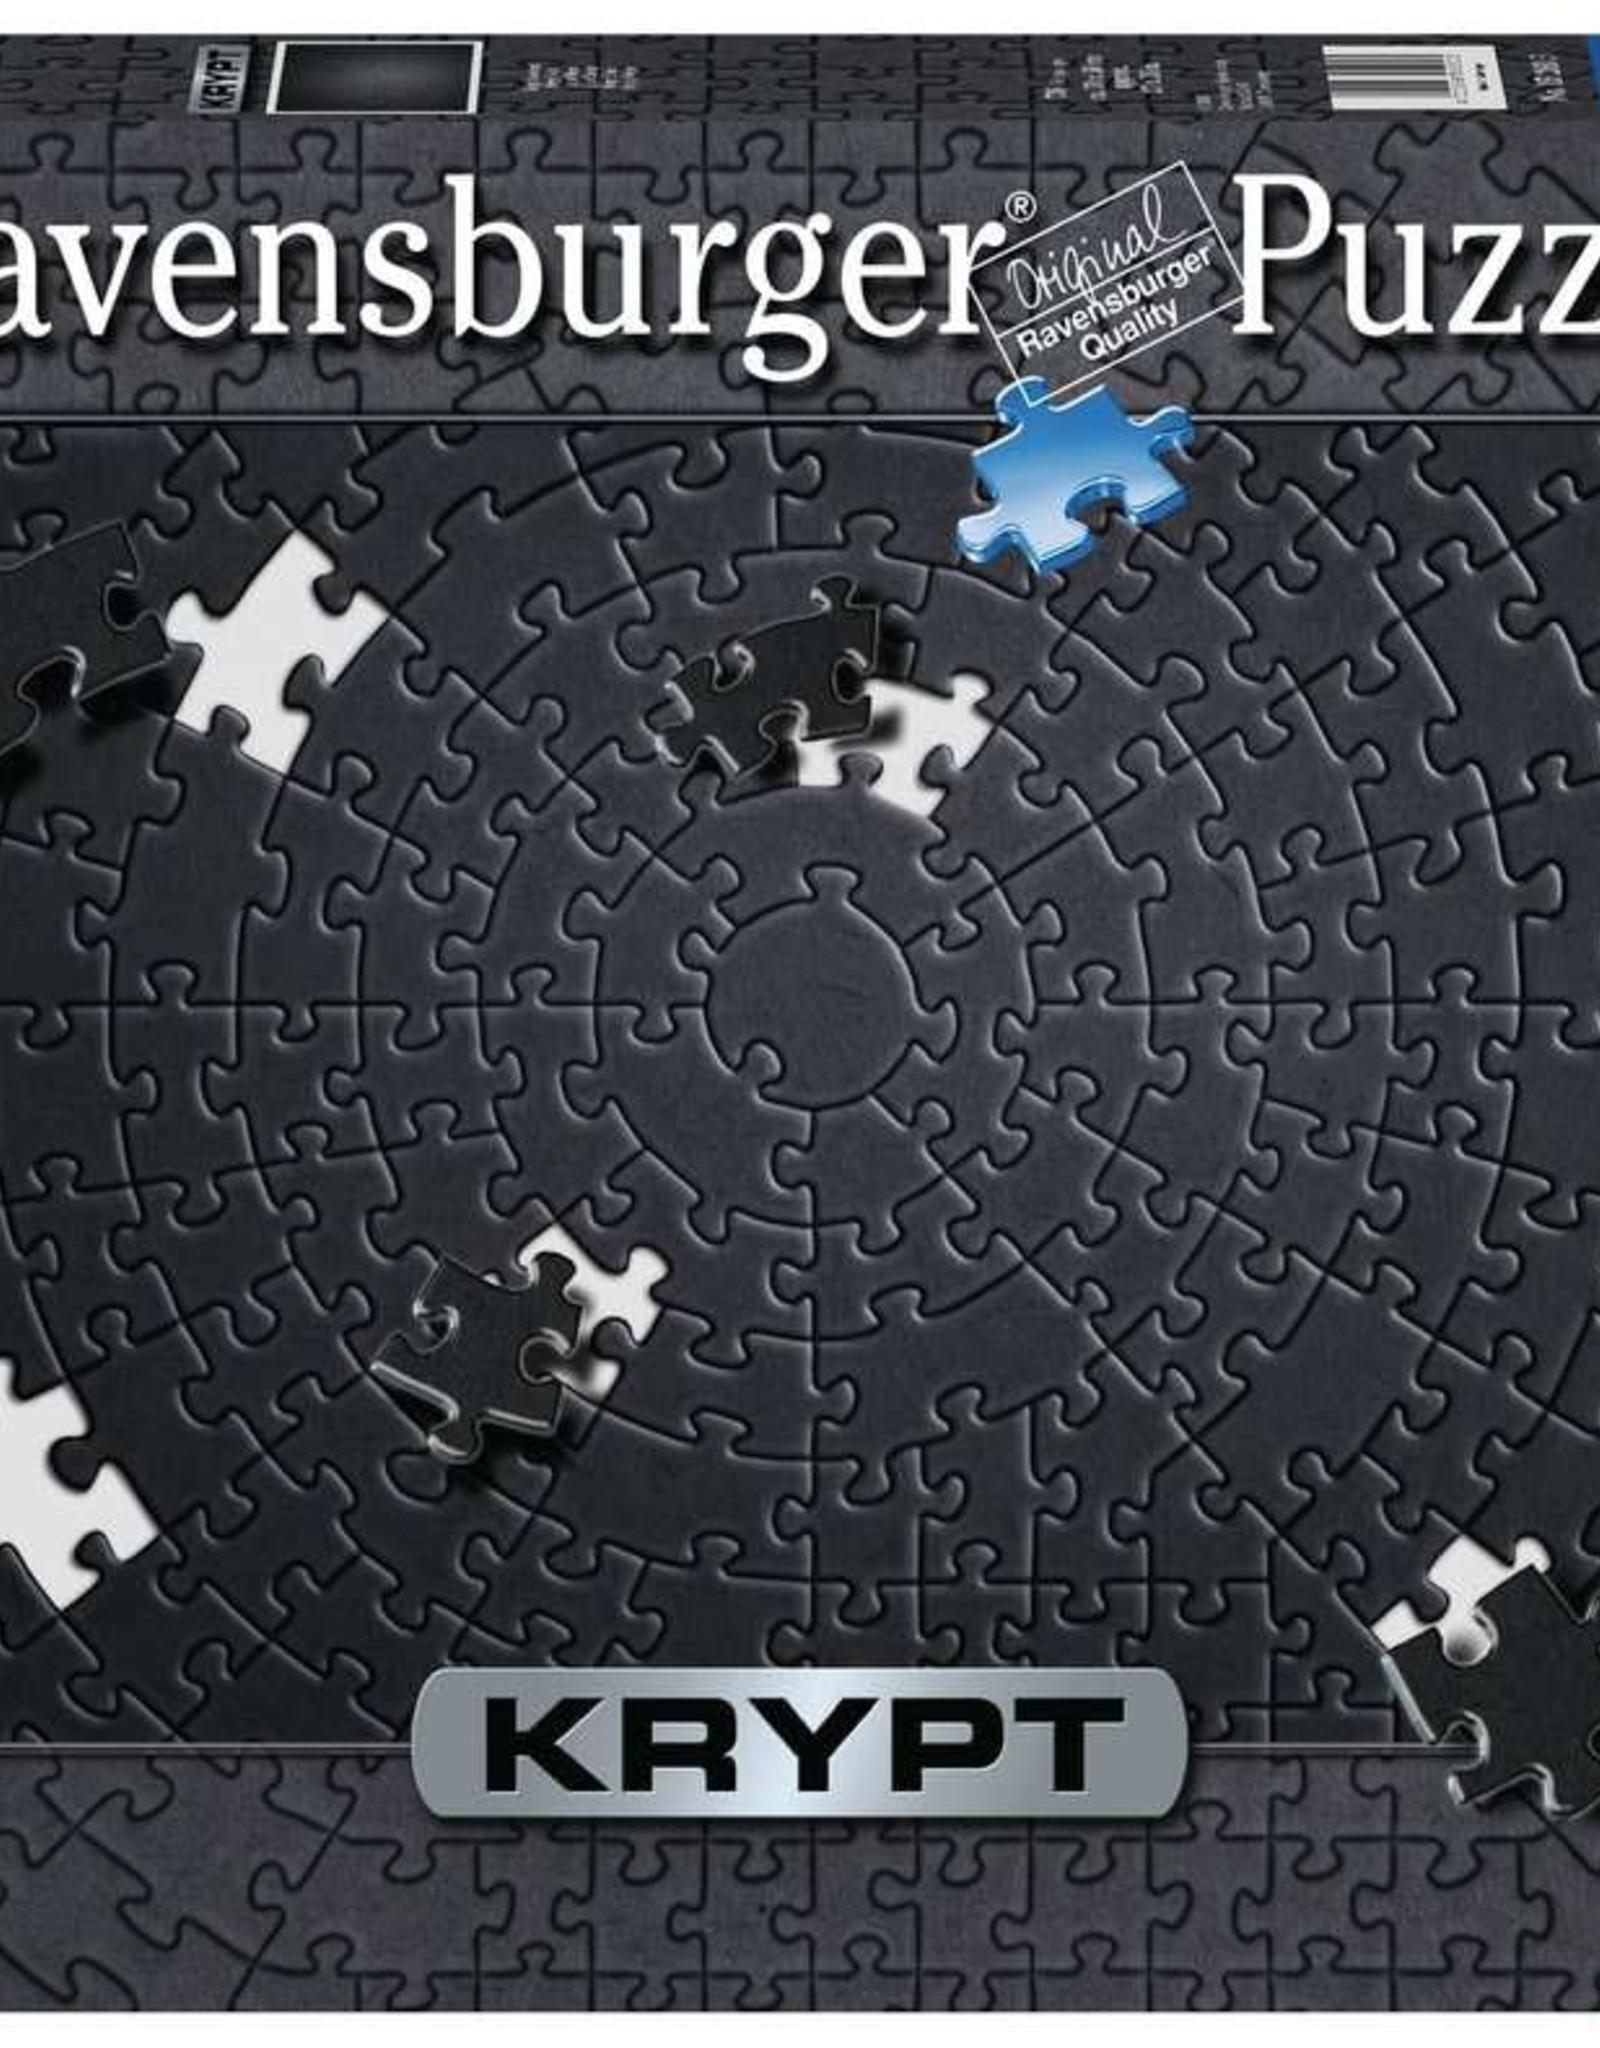 Ravensburger Puzzle 736 pc: Krypt Black